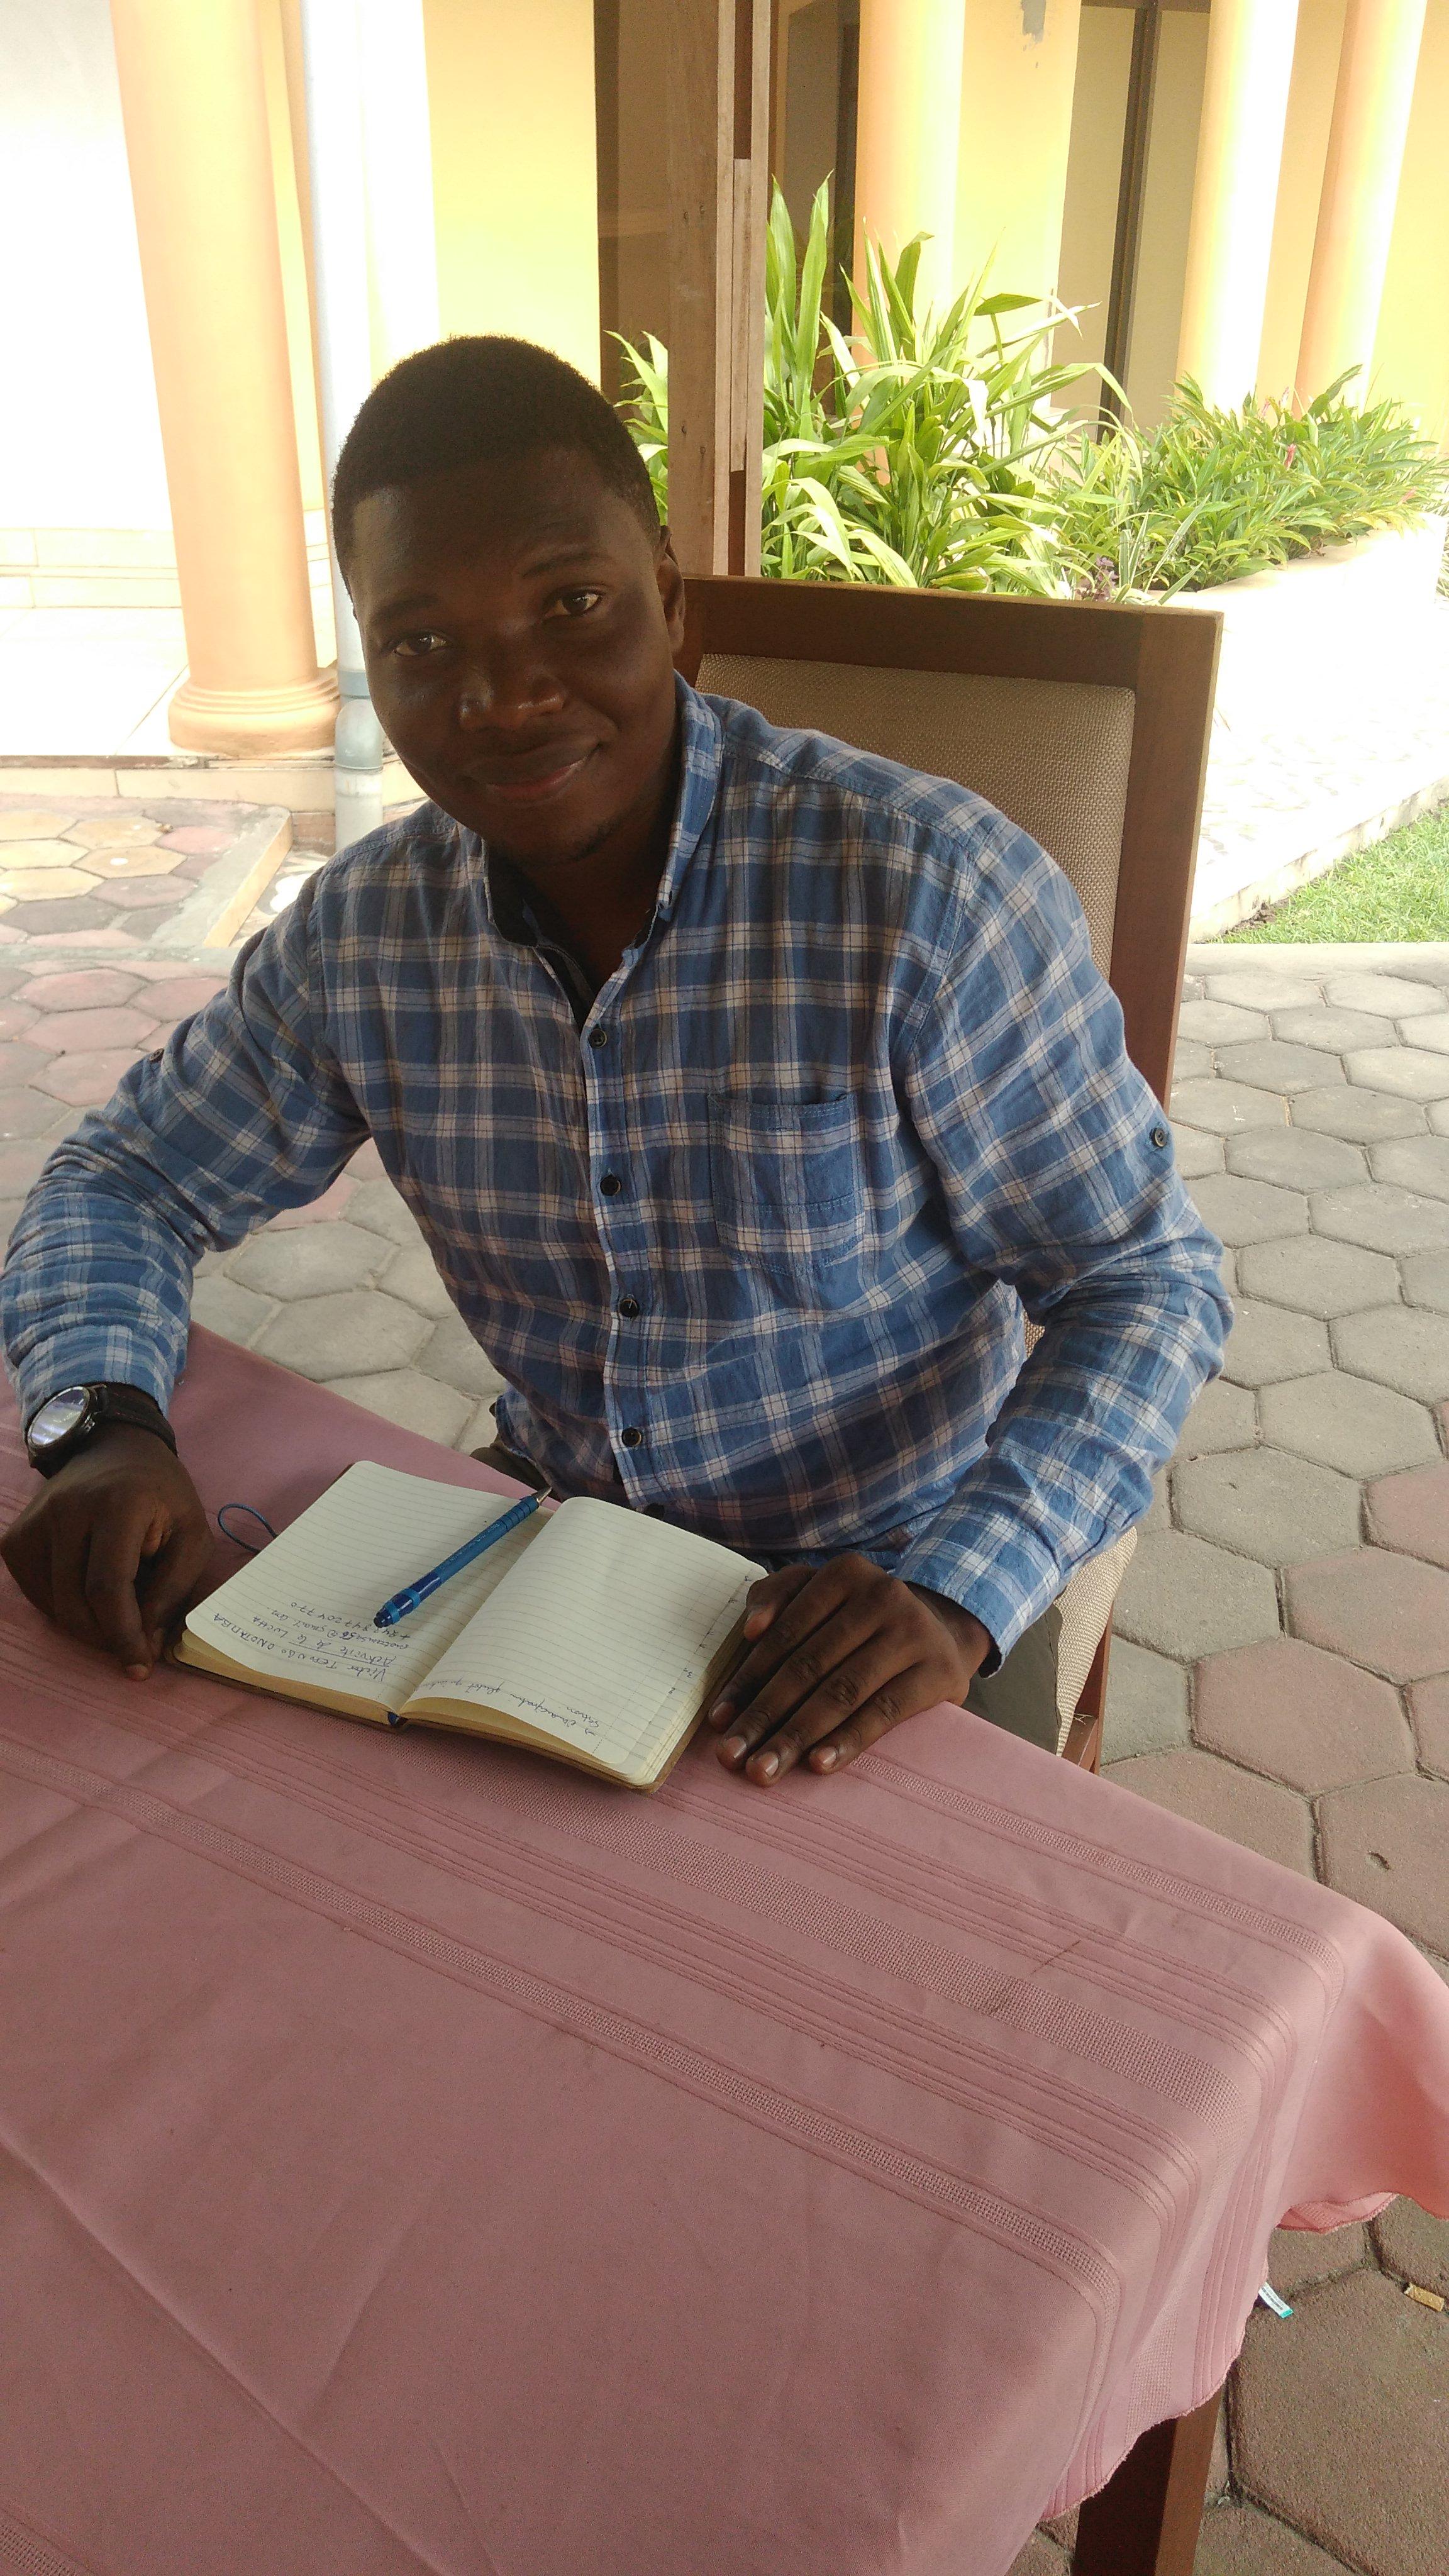 2017_analyse_2017_les_jeunes_congolais_cd.jpg